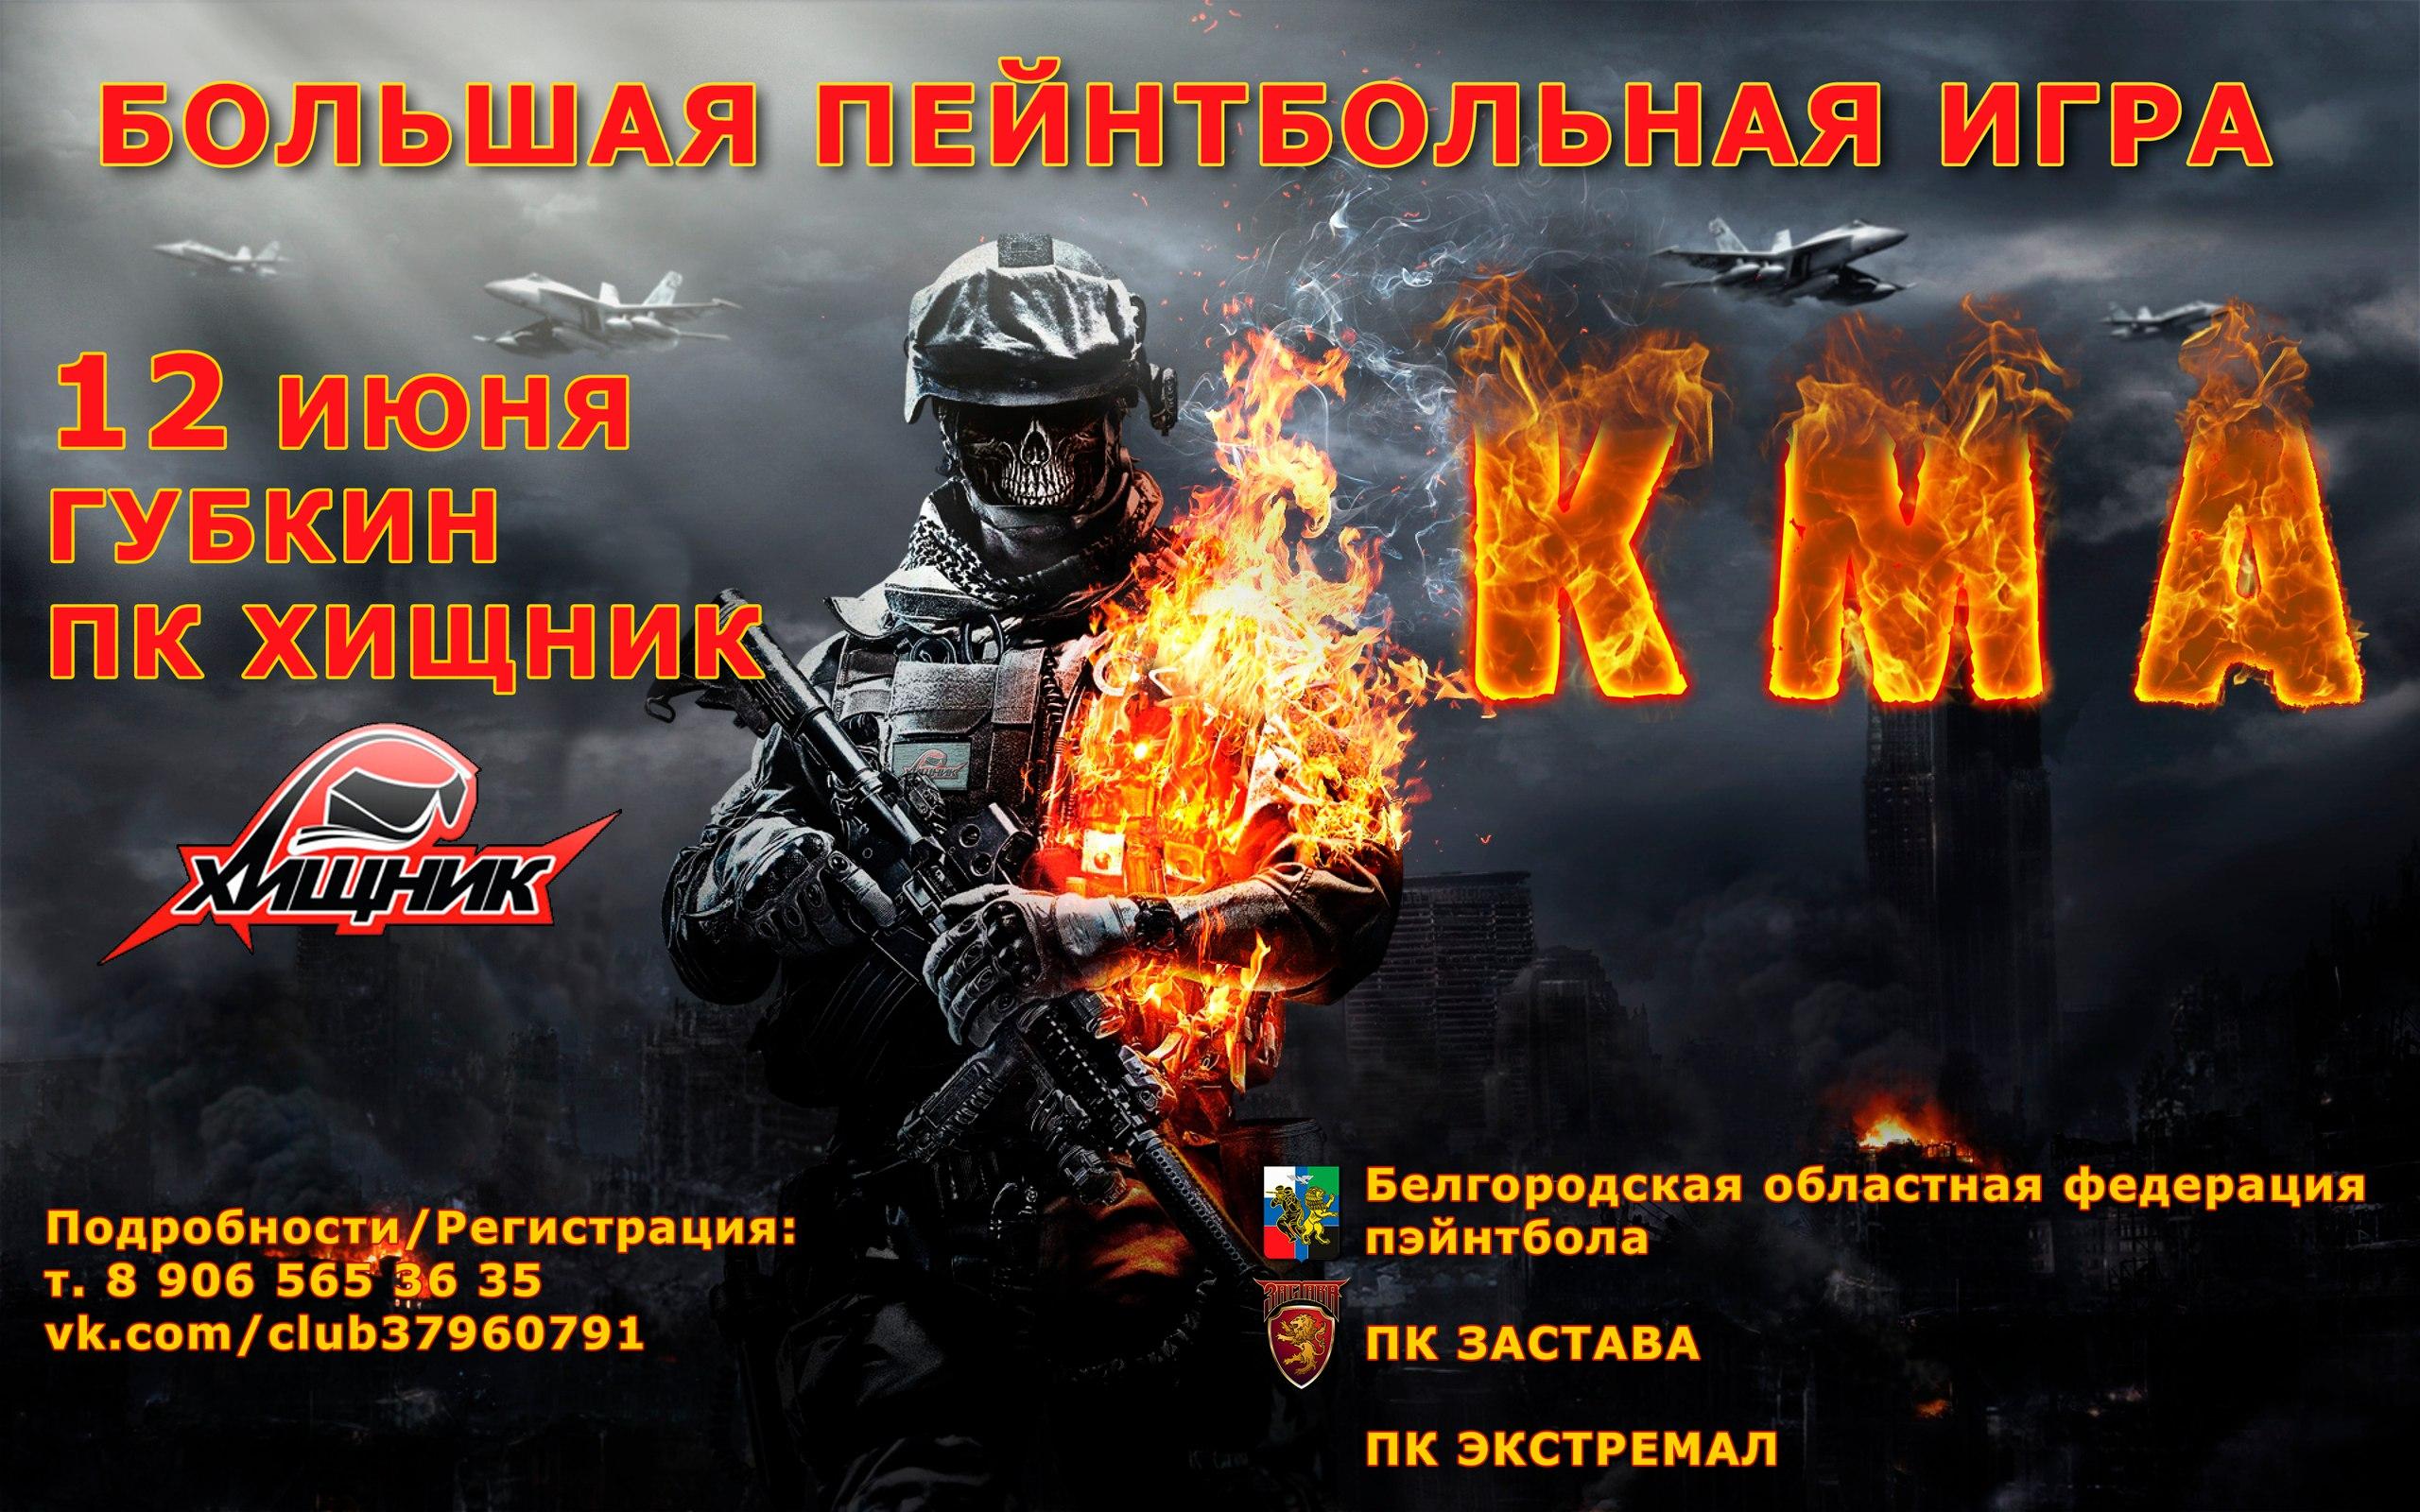 PVVVz4-KKkc.jpg